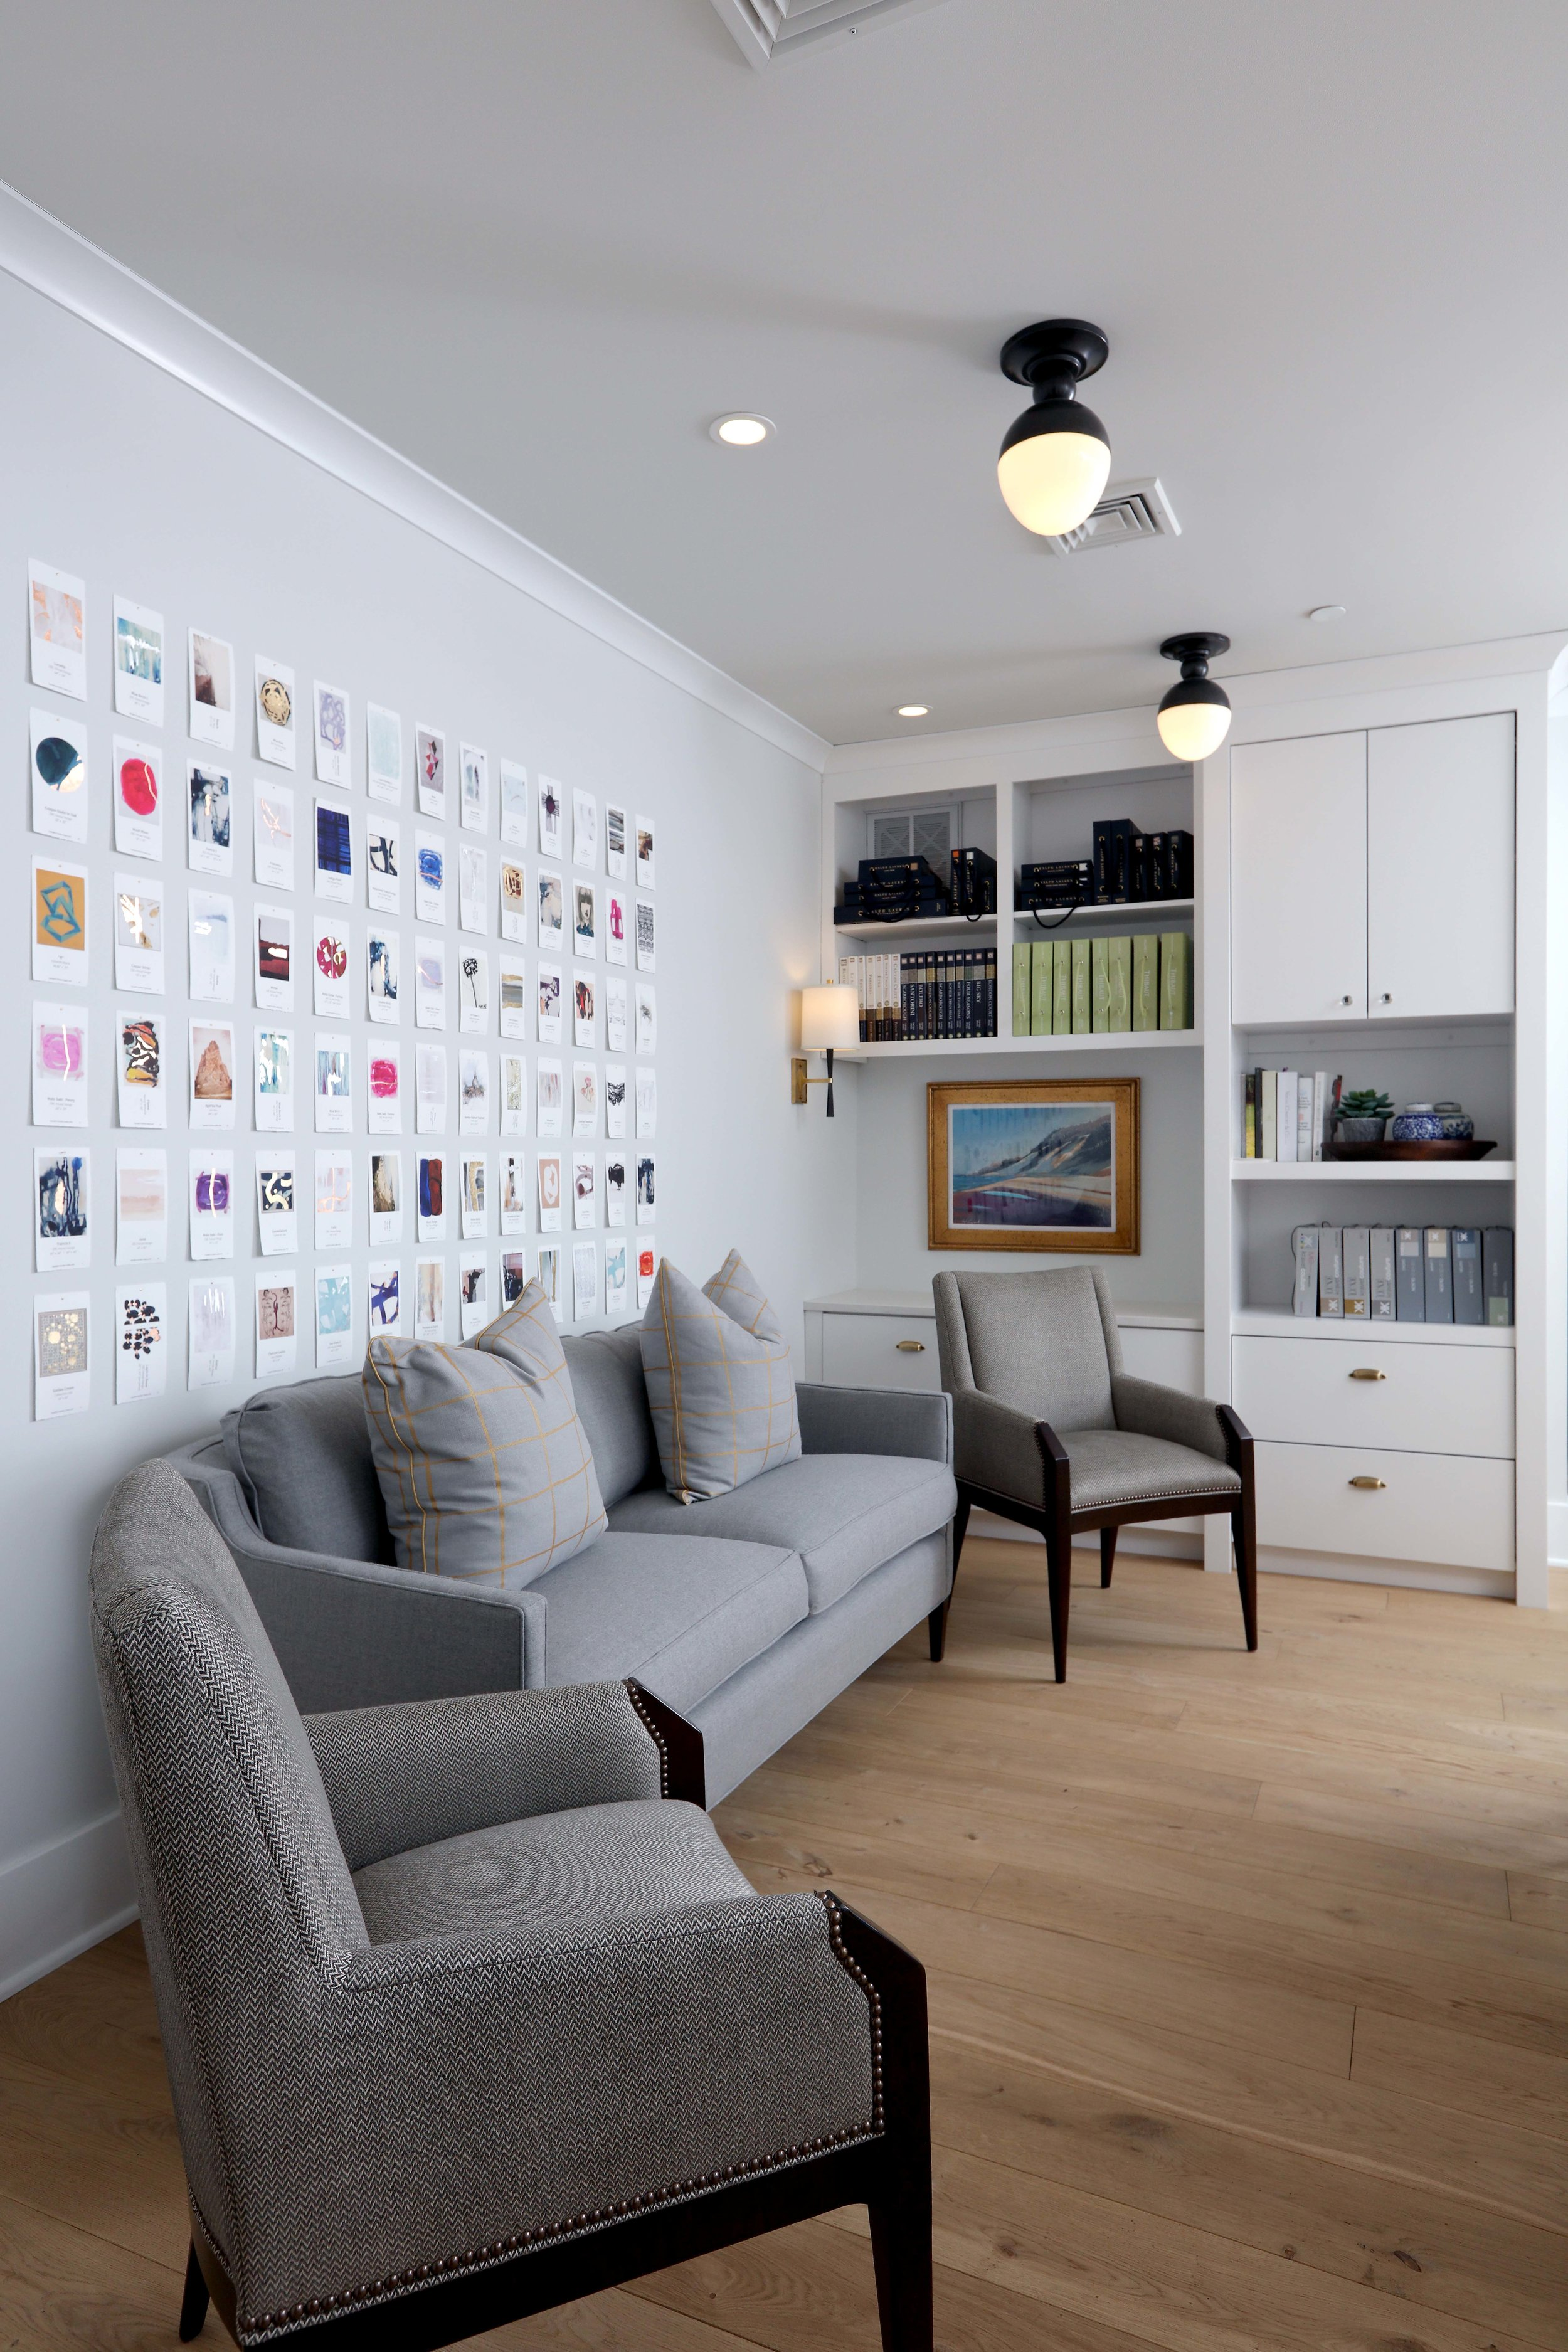 Vision-Interiors-Visbeen-Showroom-Grand-Rapids-Zoe-Bios-Art-Design.jpg